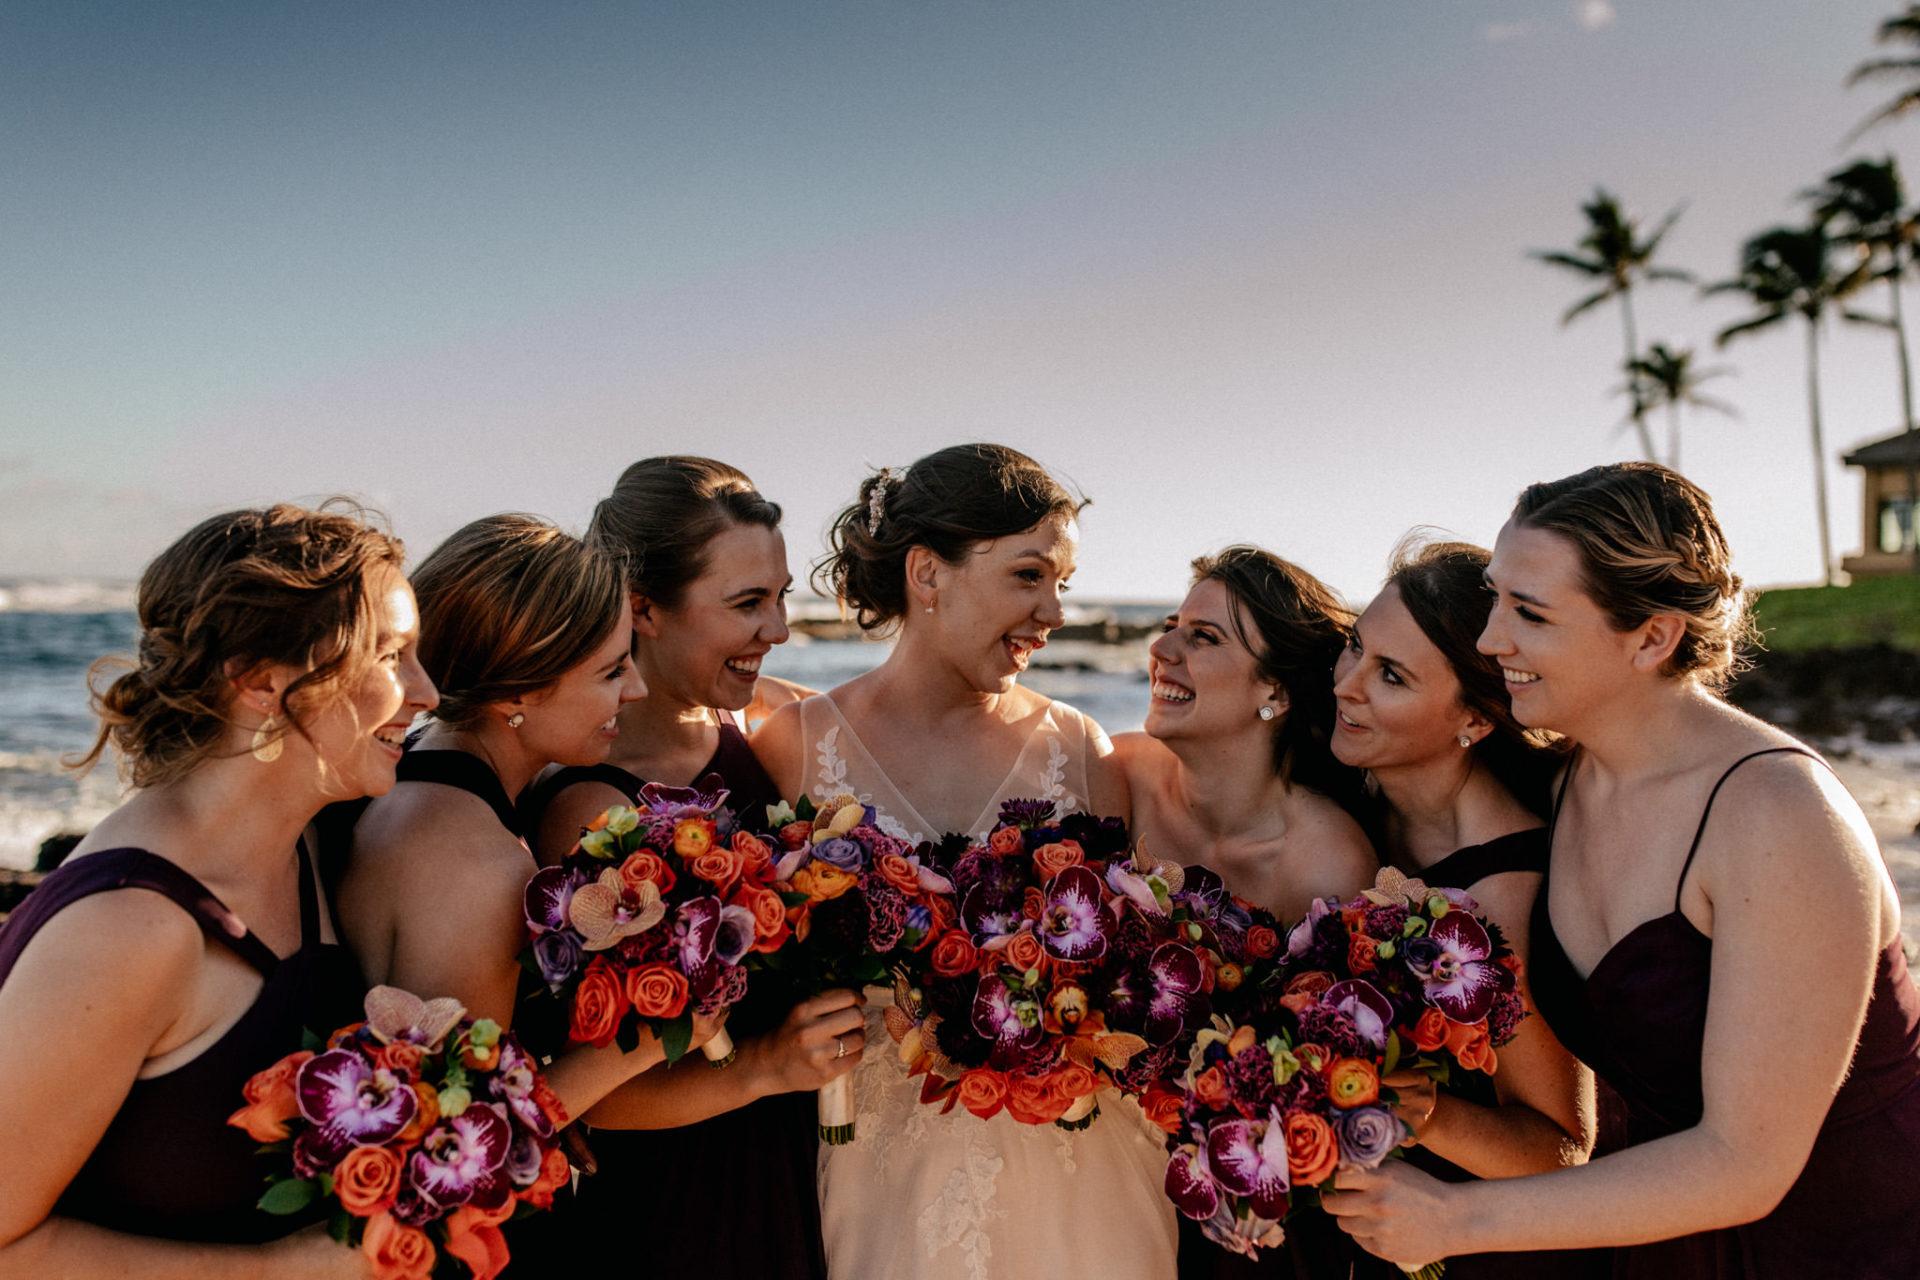 Hawaii Hochzeit-destination wedding kauai-Plantation Gardens Koloa Poipu-Trauzeugen